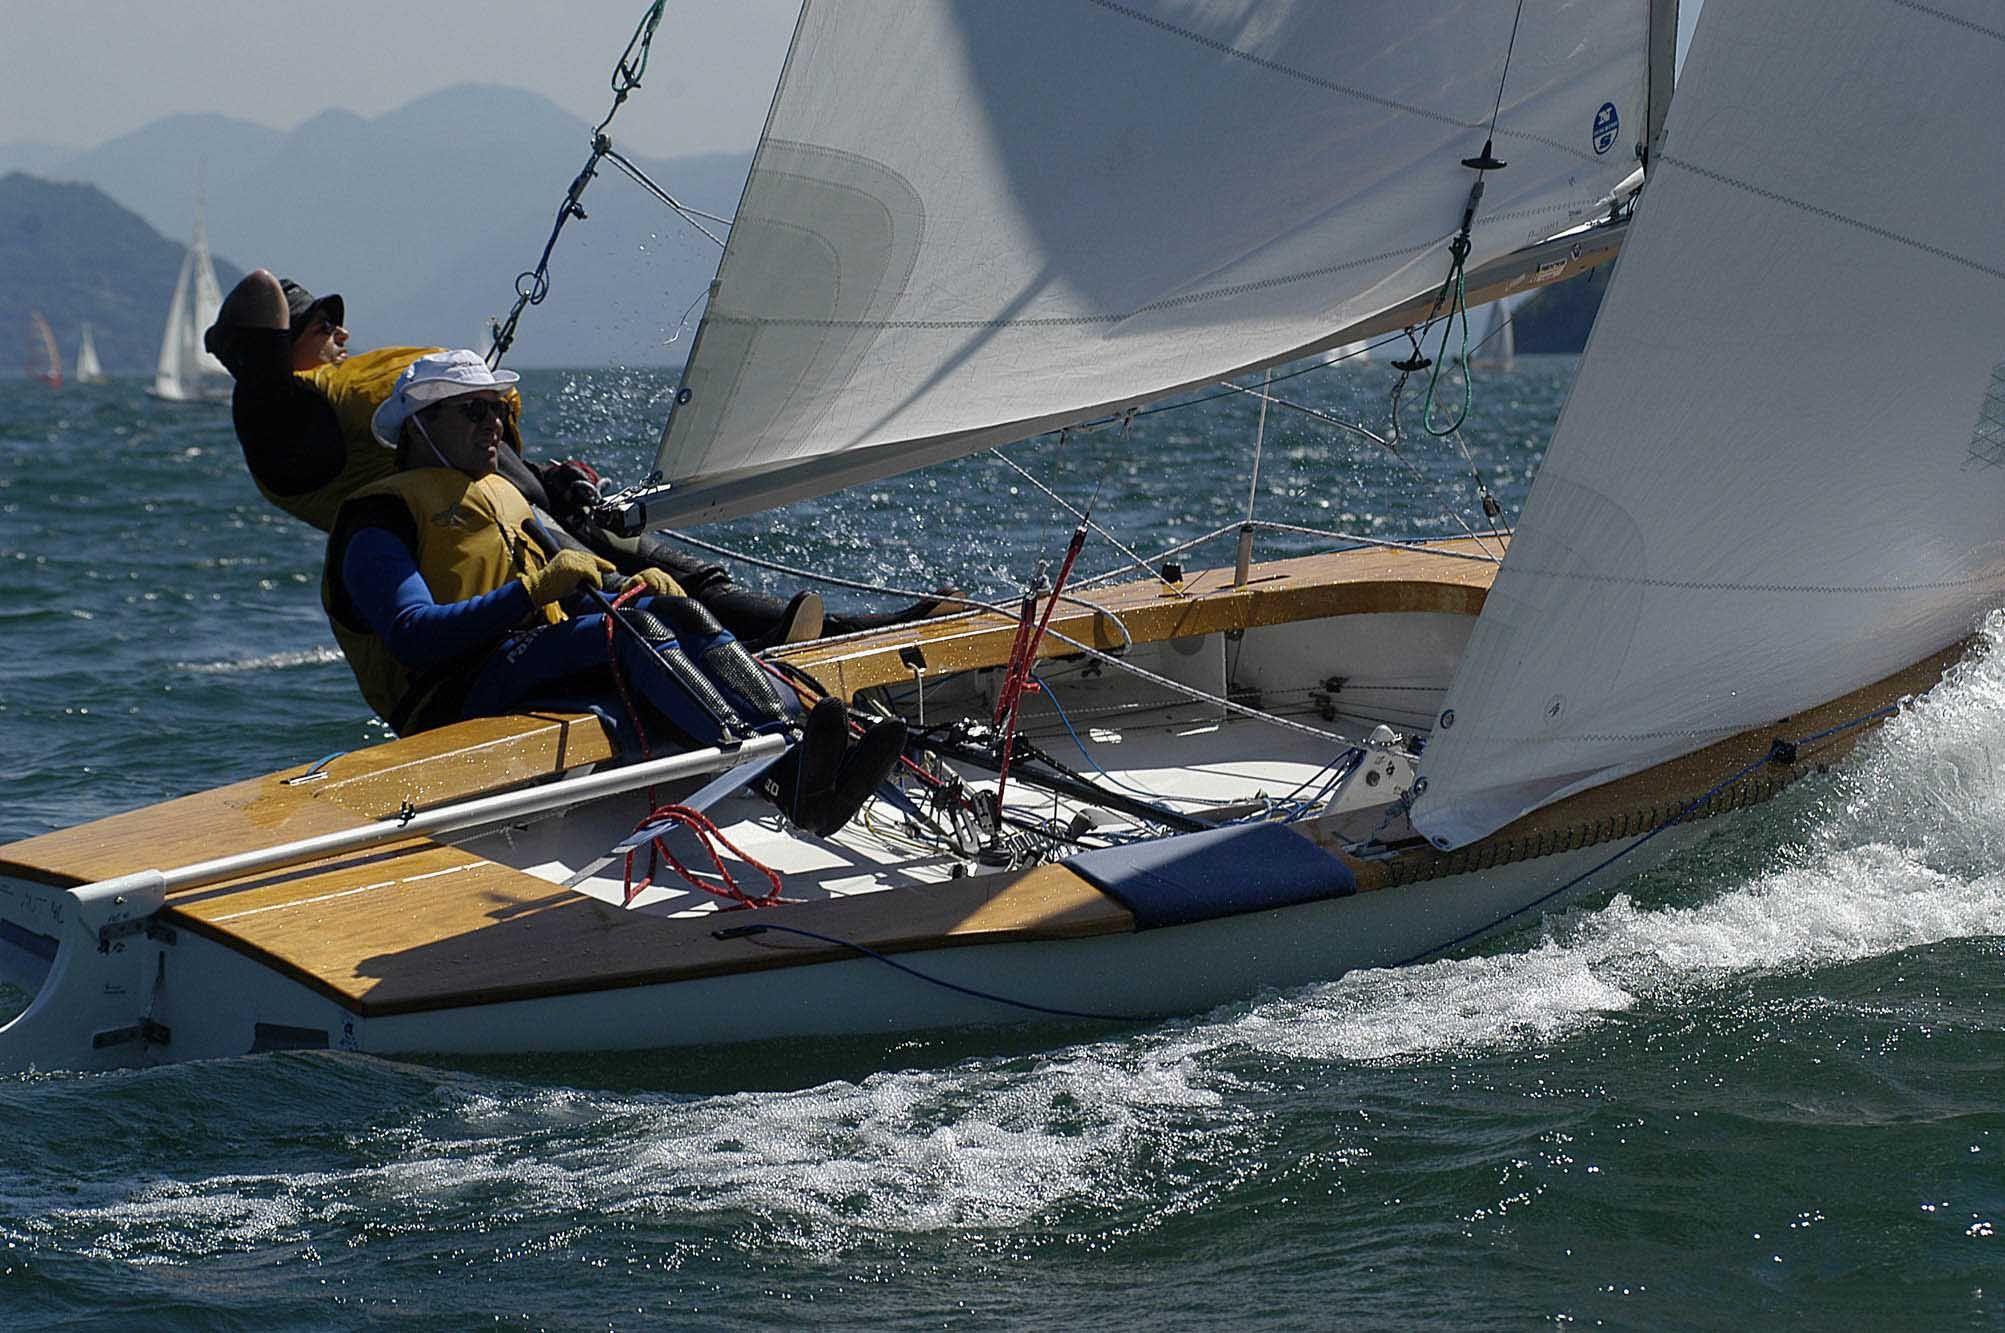 flying dutchman sailing and small boating pinterest segeln und h tten. Black Bedroom Furniture Sets. Home Design Ideas